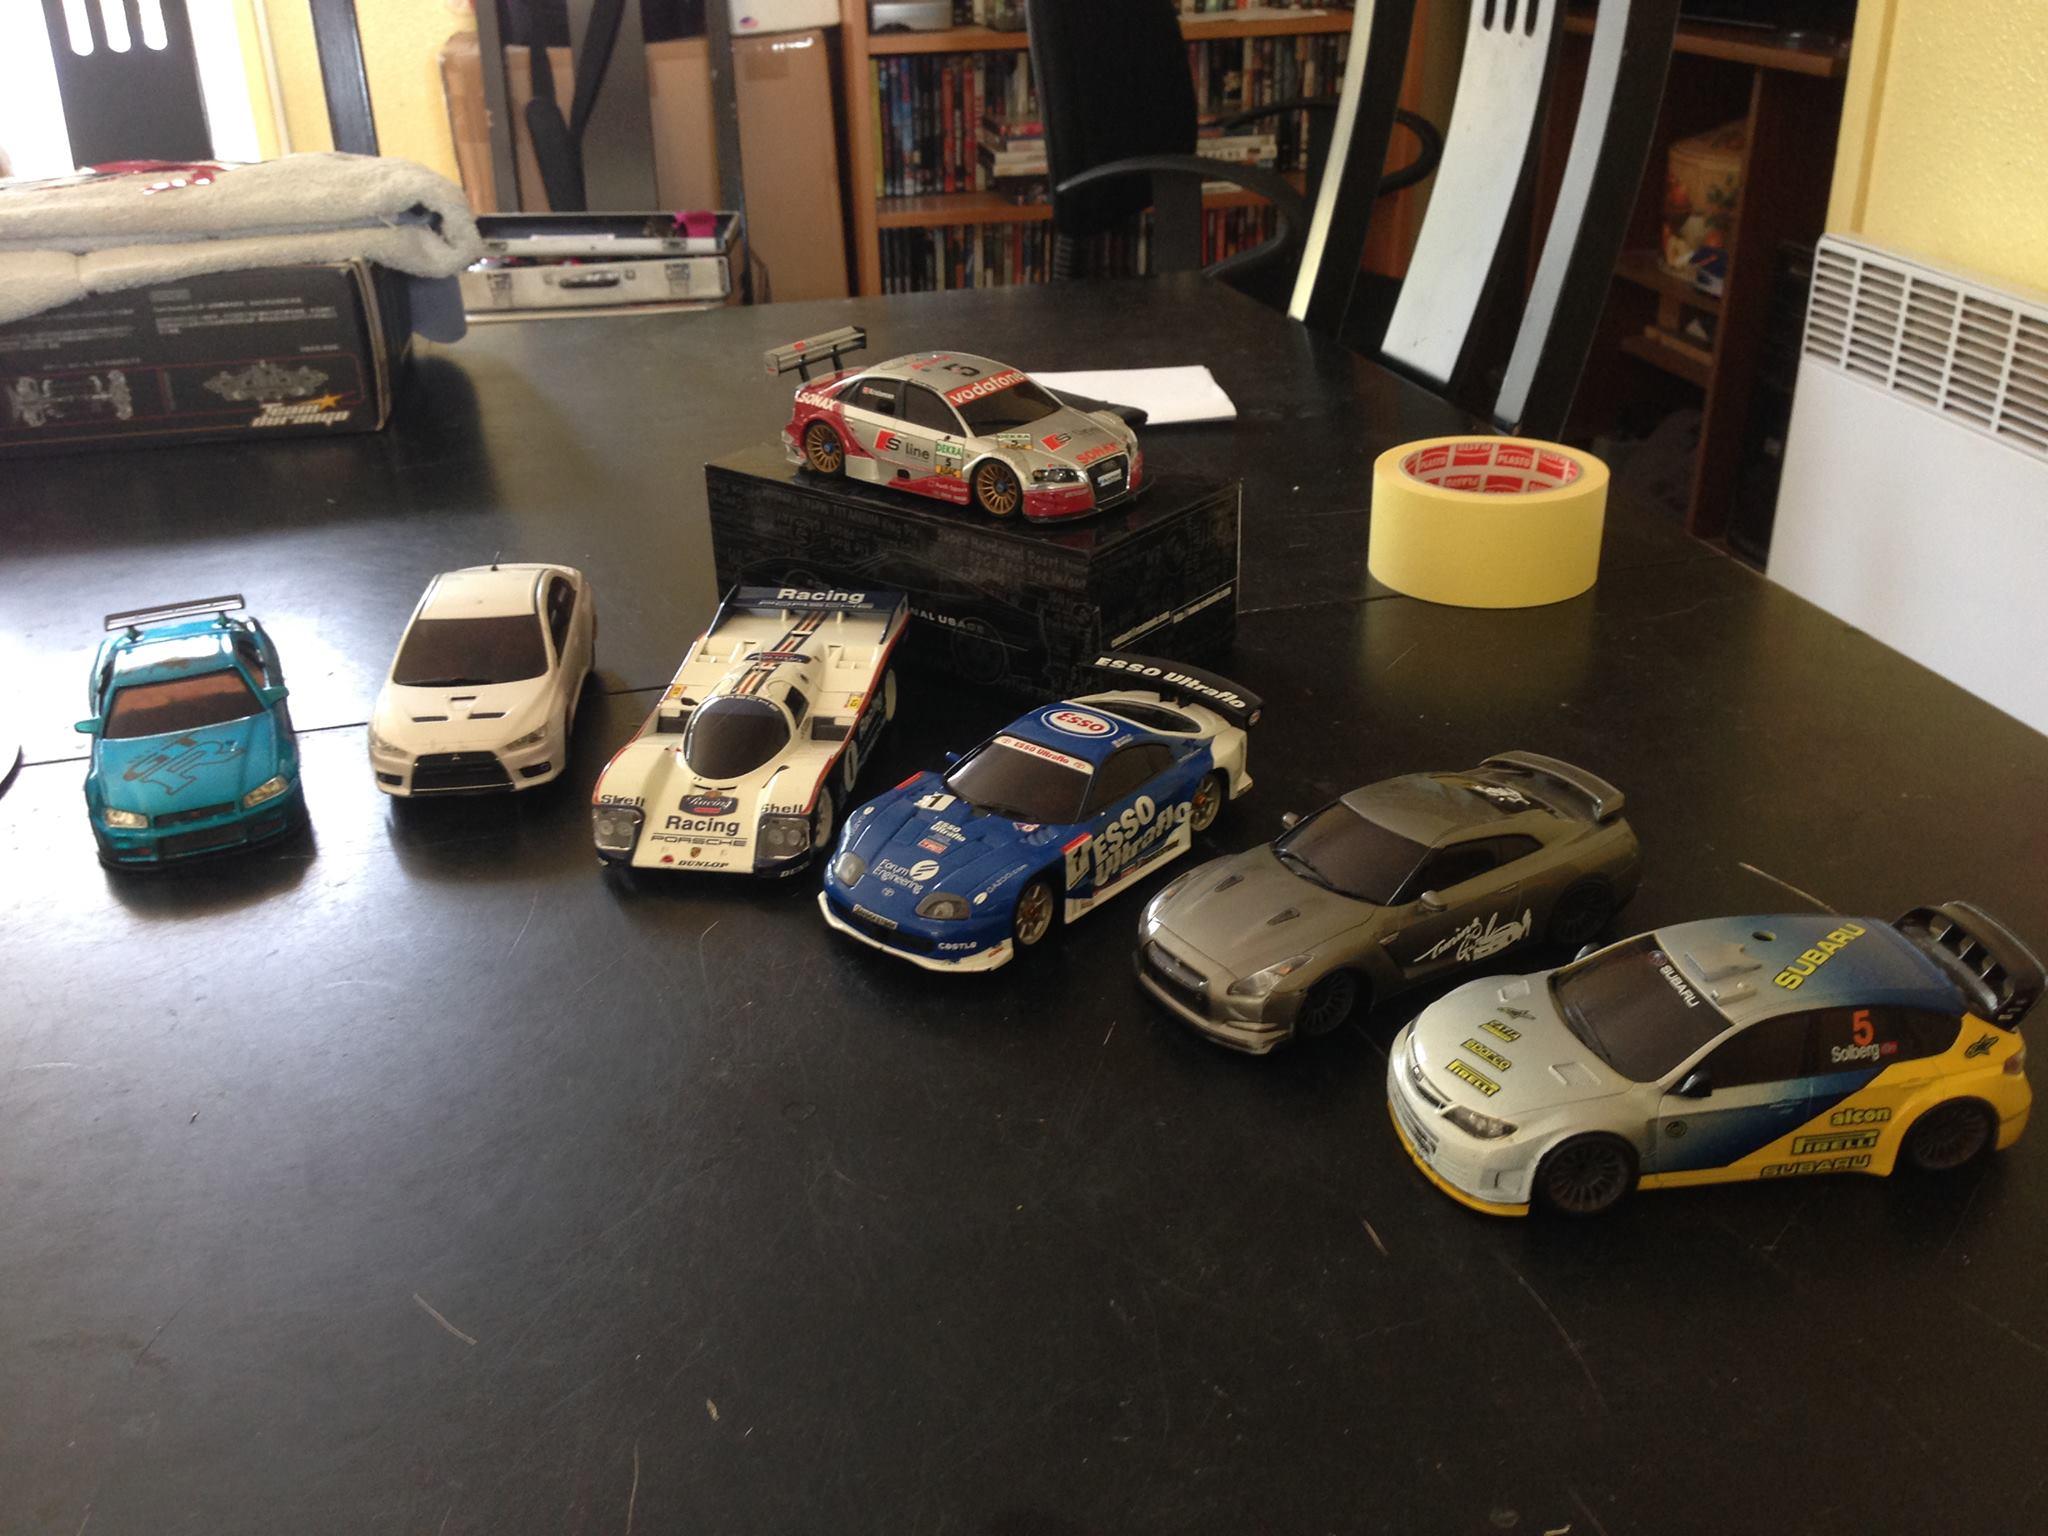 mon nouveau garage 86962211537604102056405558305702065801386576667365o